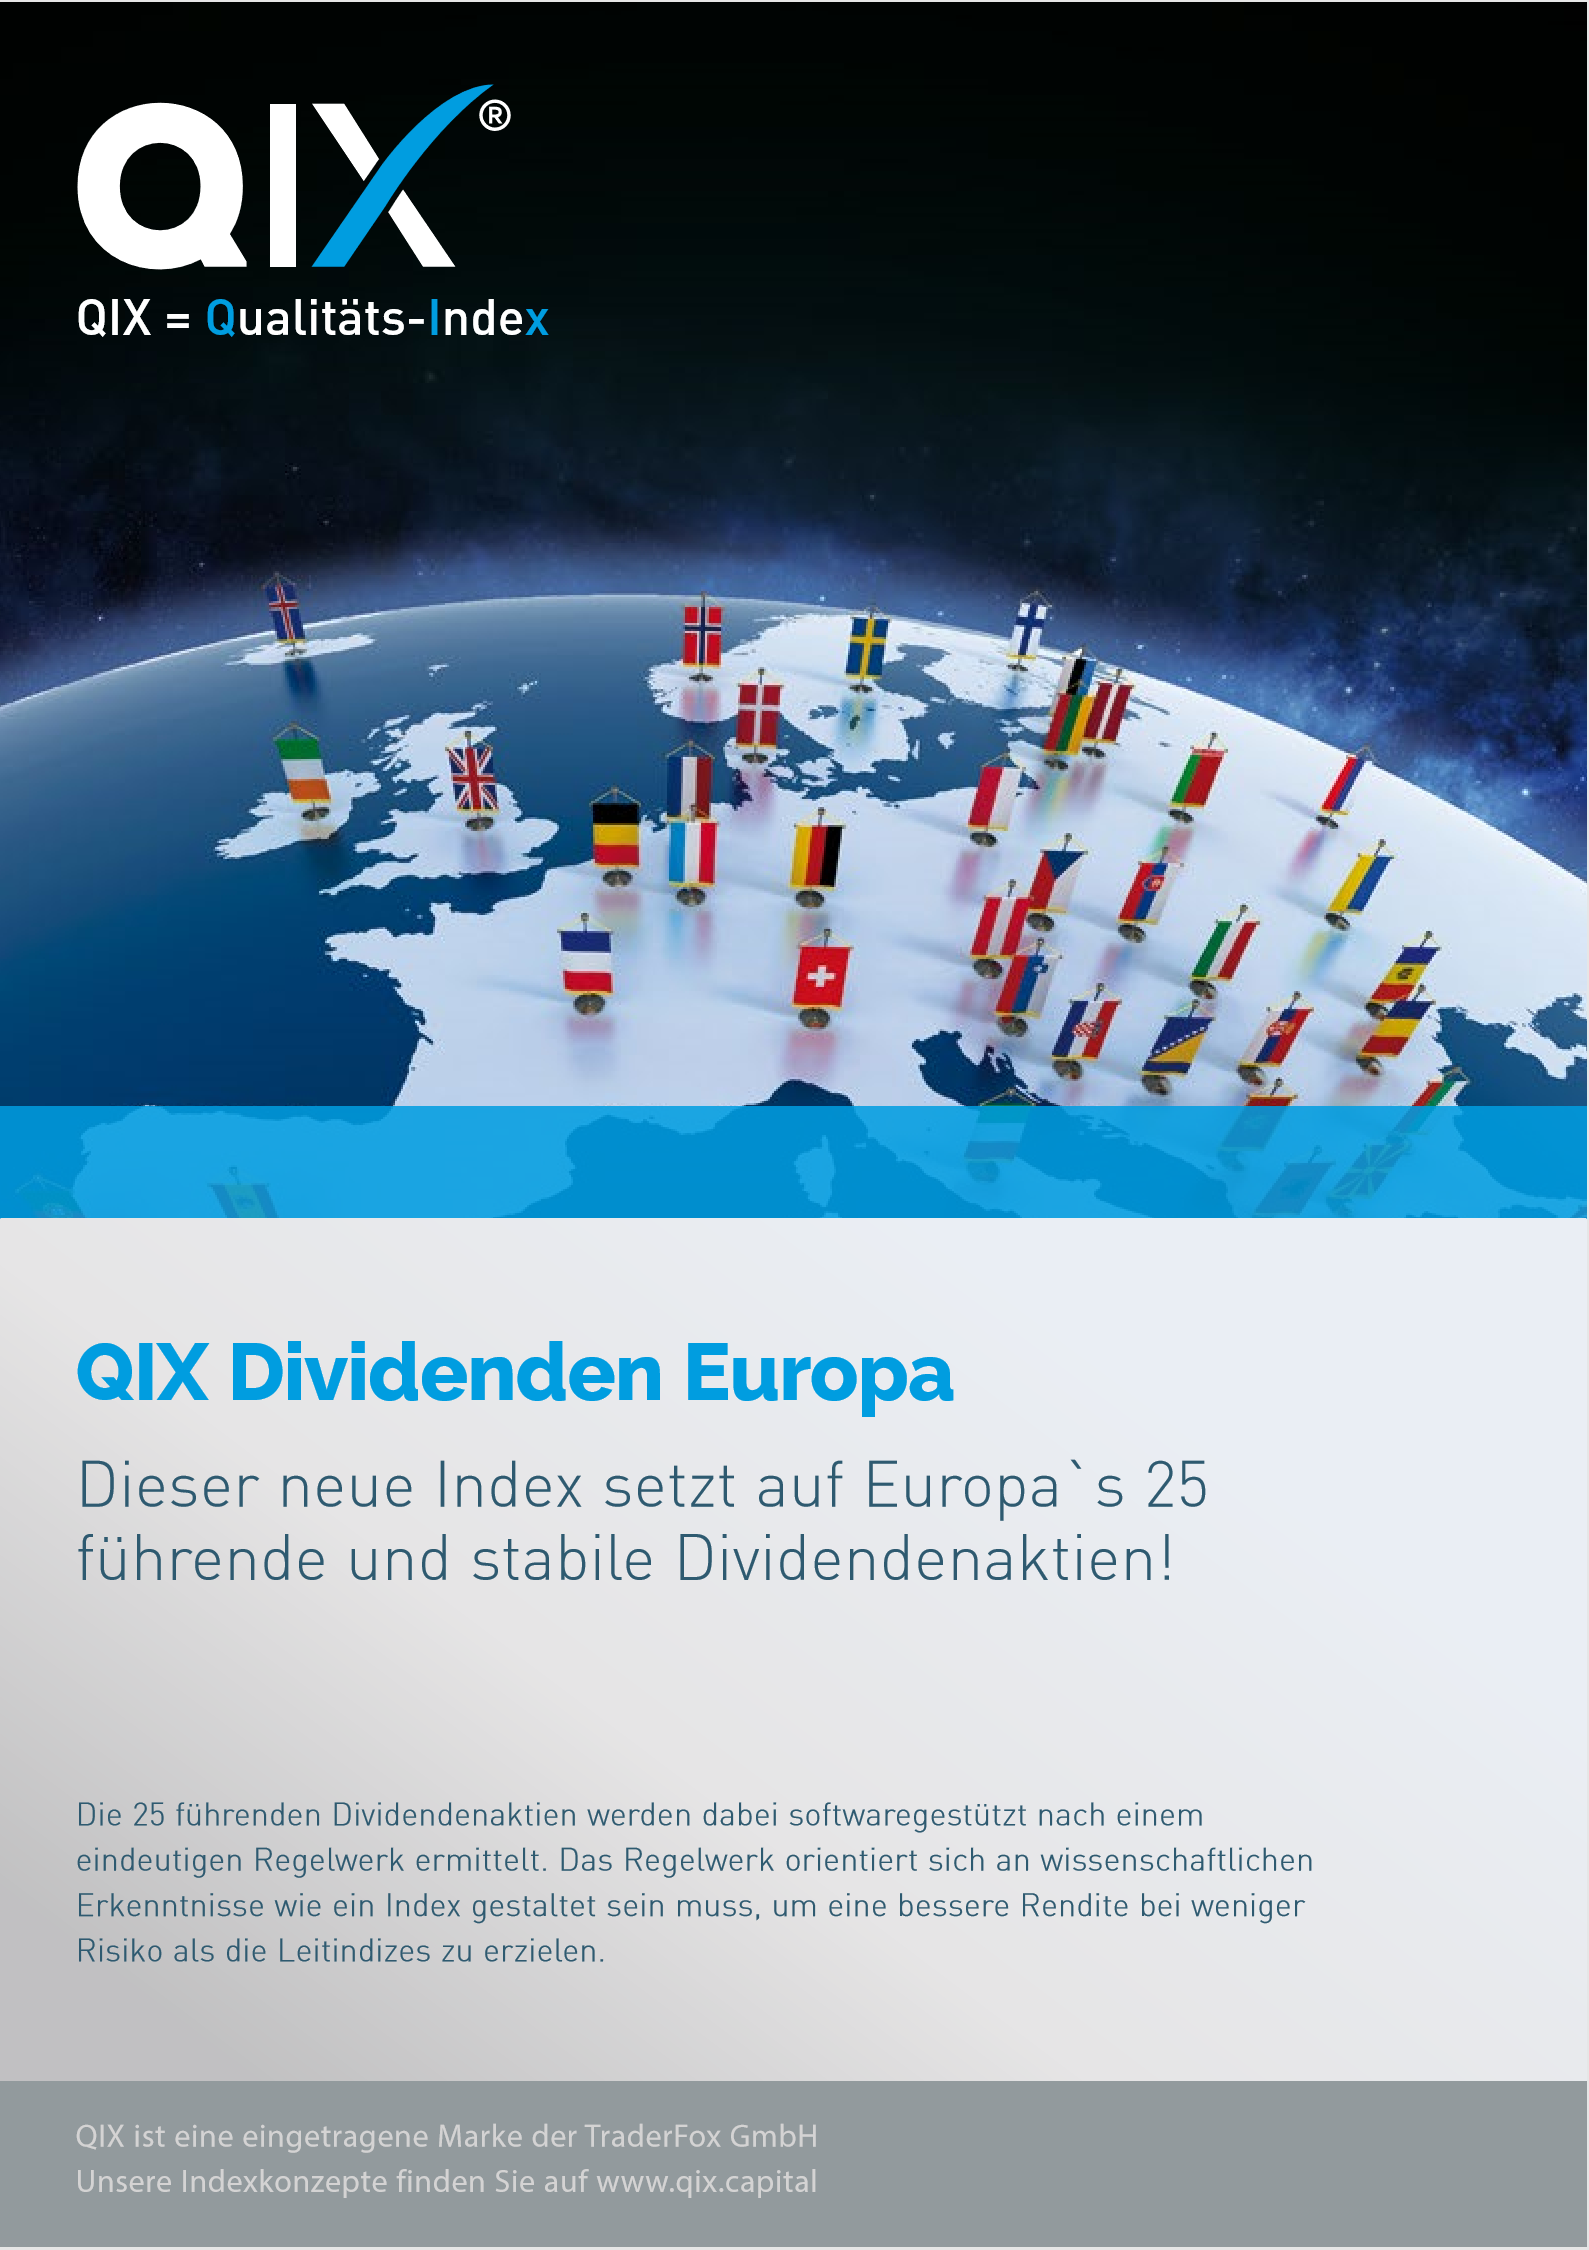 qix-dividenden-europa-cover